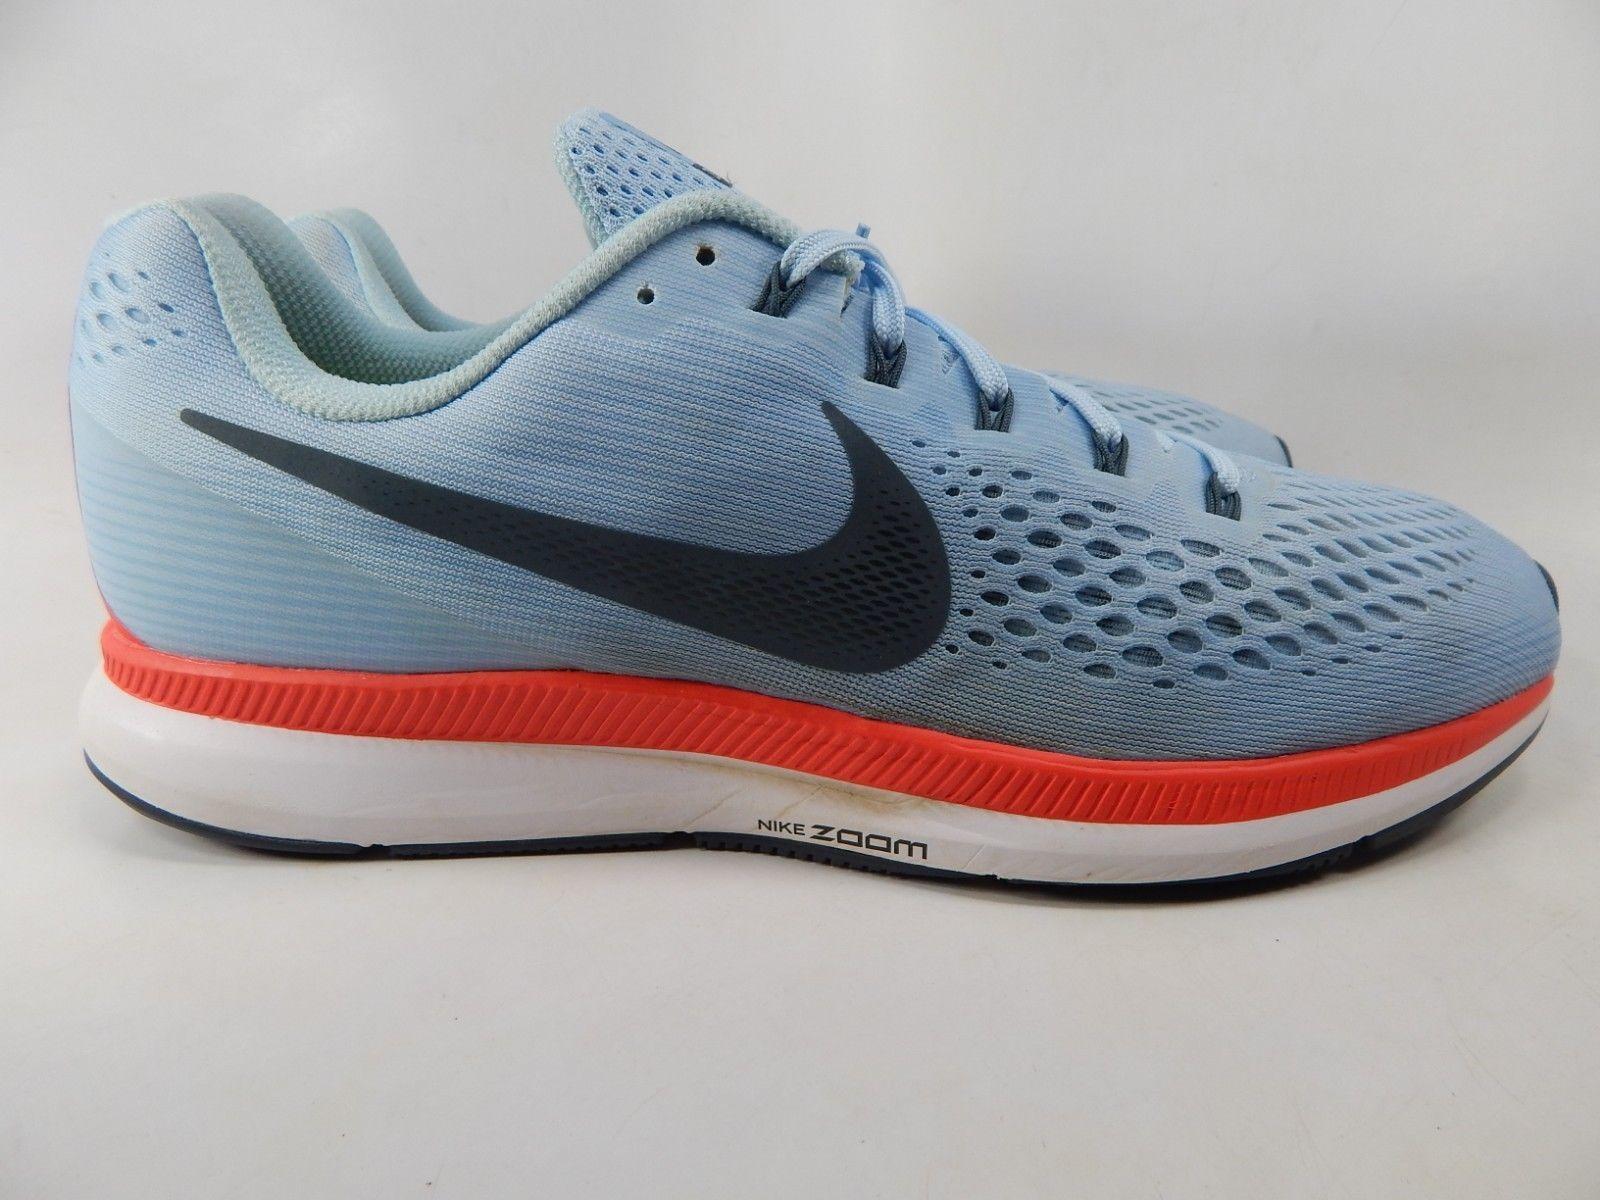 a07a3b02a612 Nike Air Zoom Pegasus 34 Size 13 M (D) EU and 15 similar items